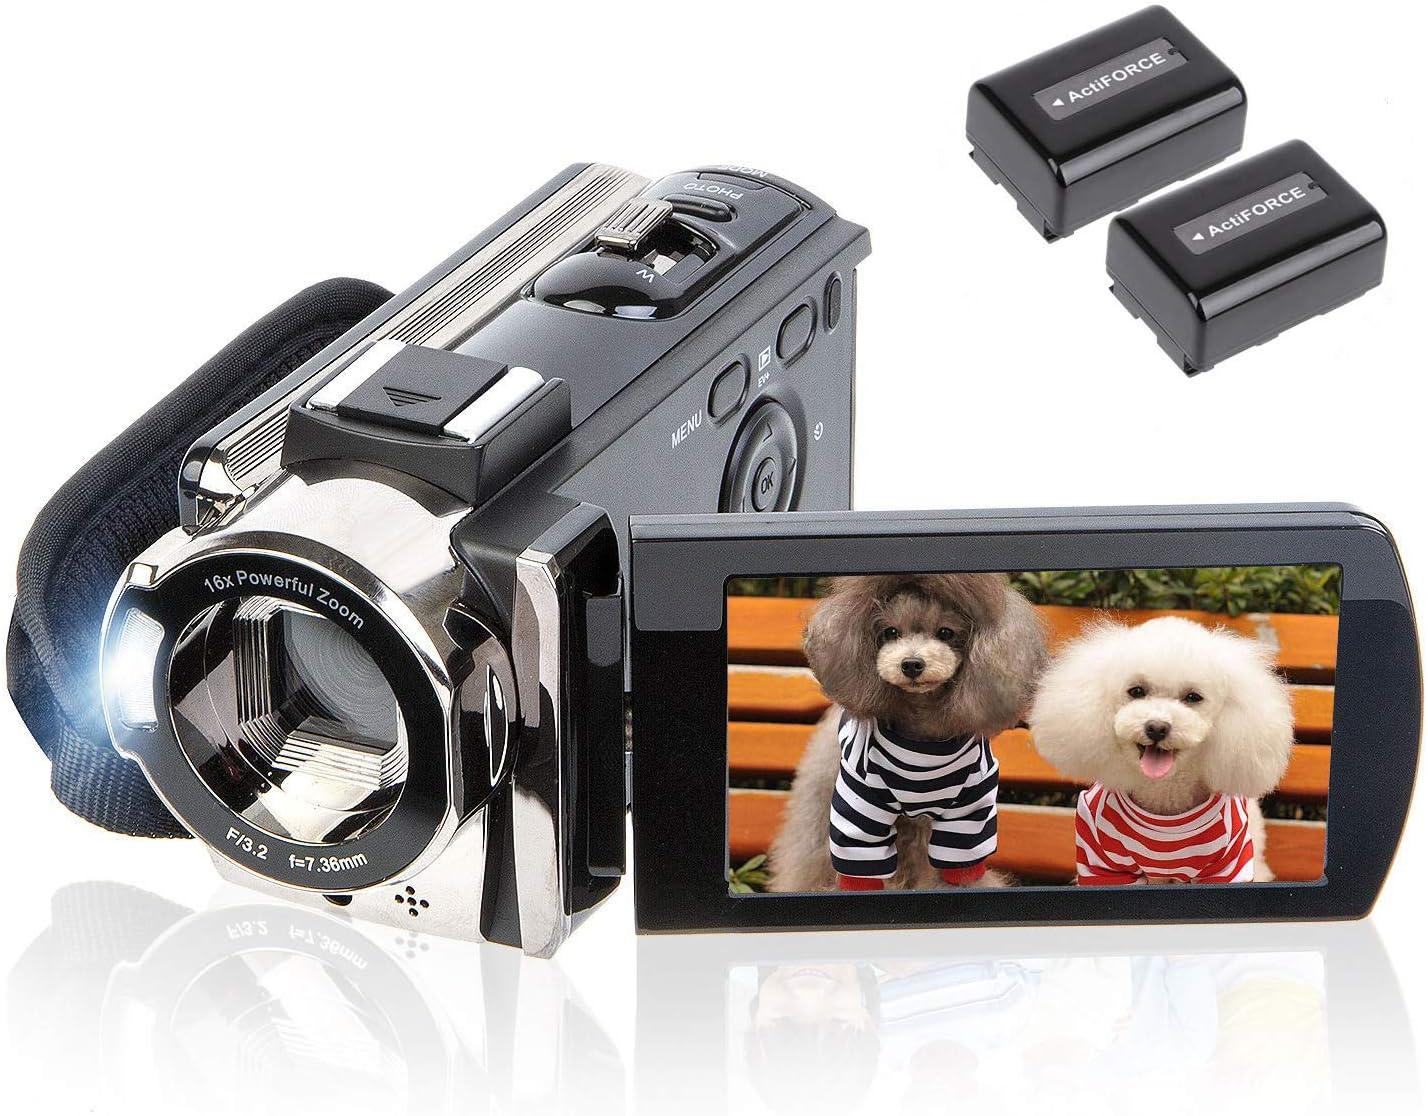 Kicteck Digital Camera Camcorder